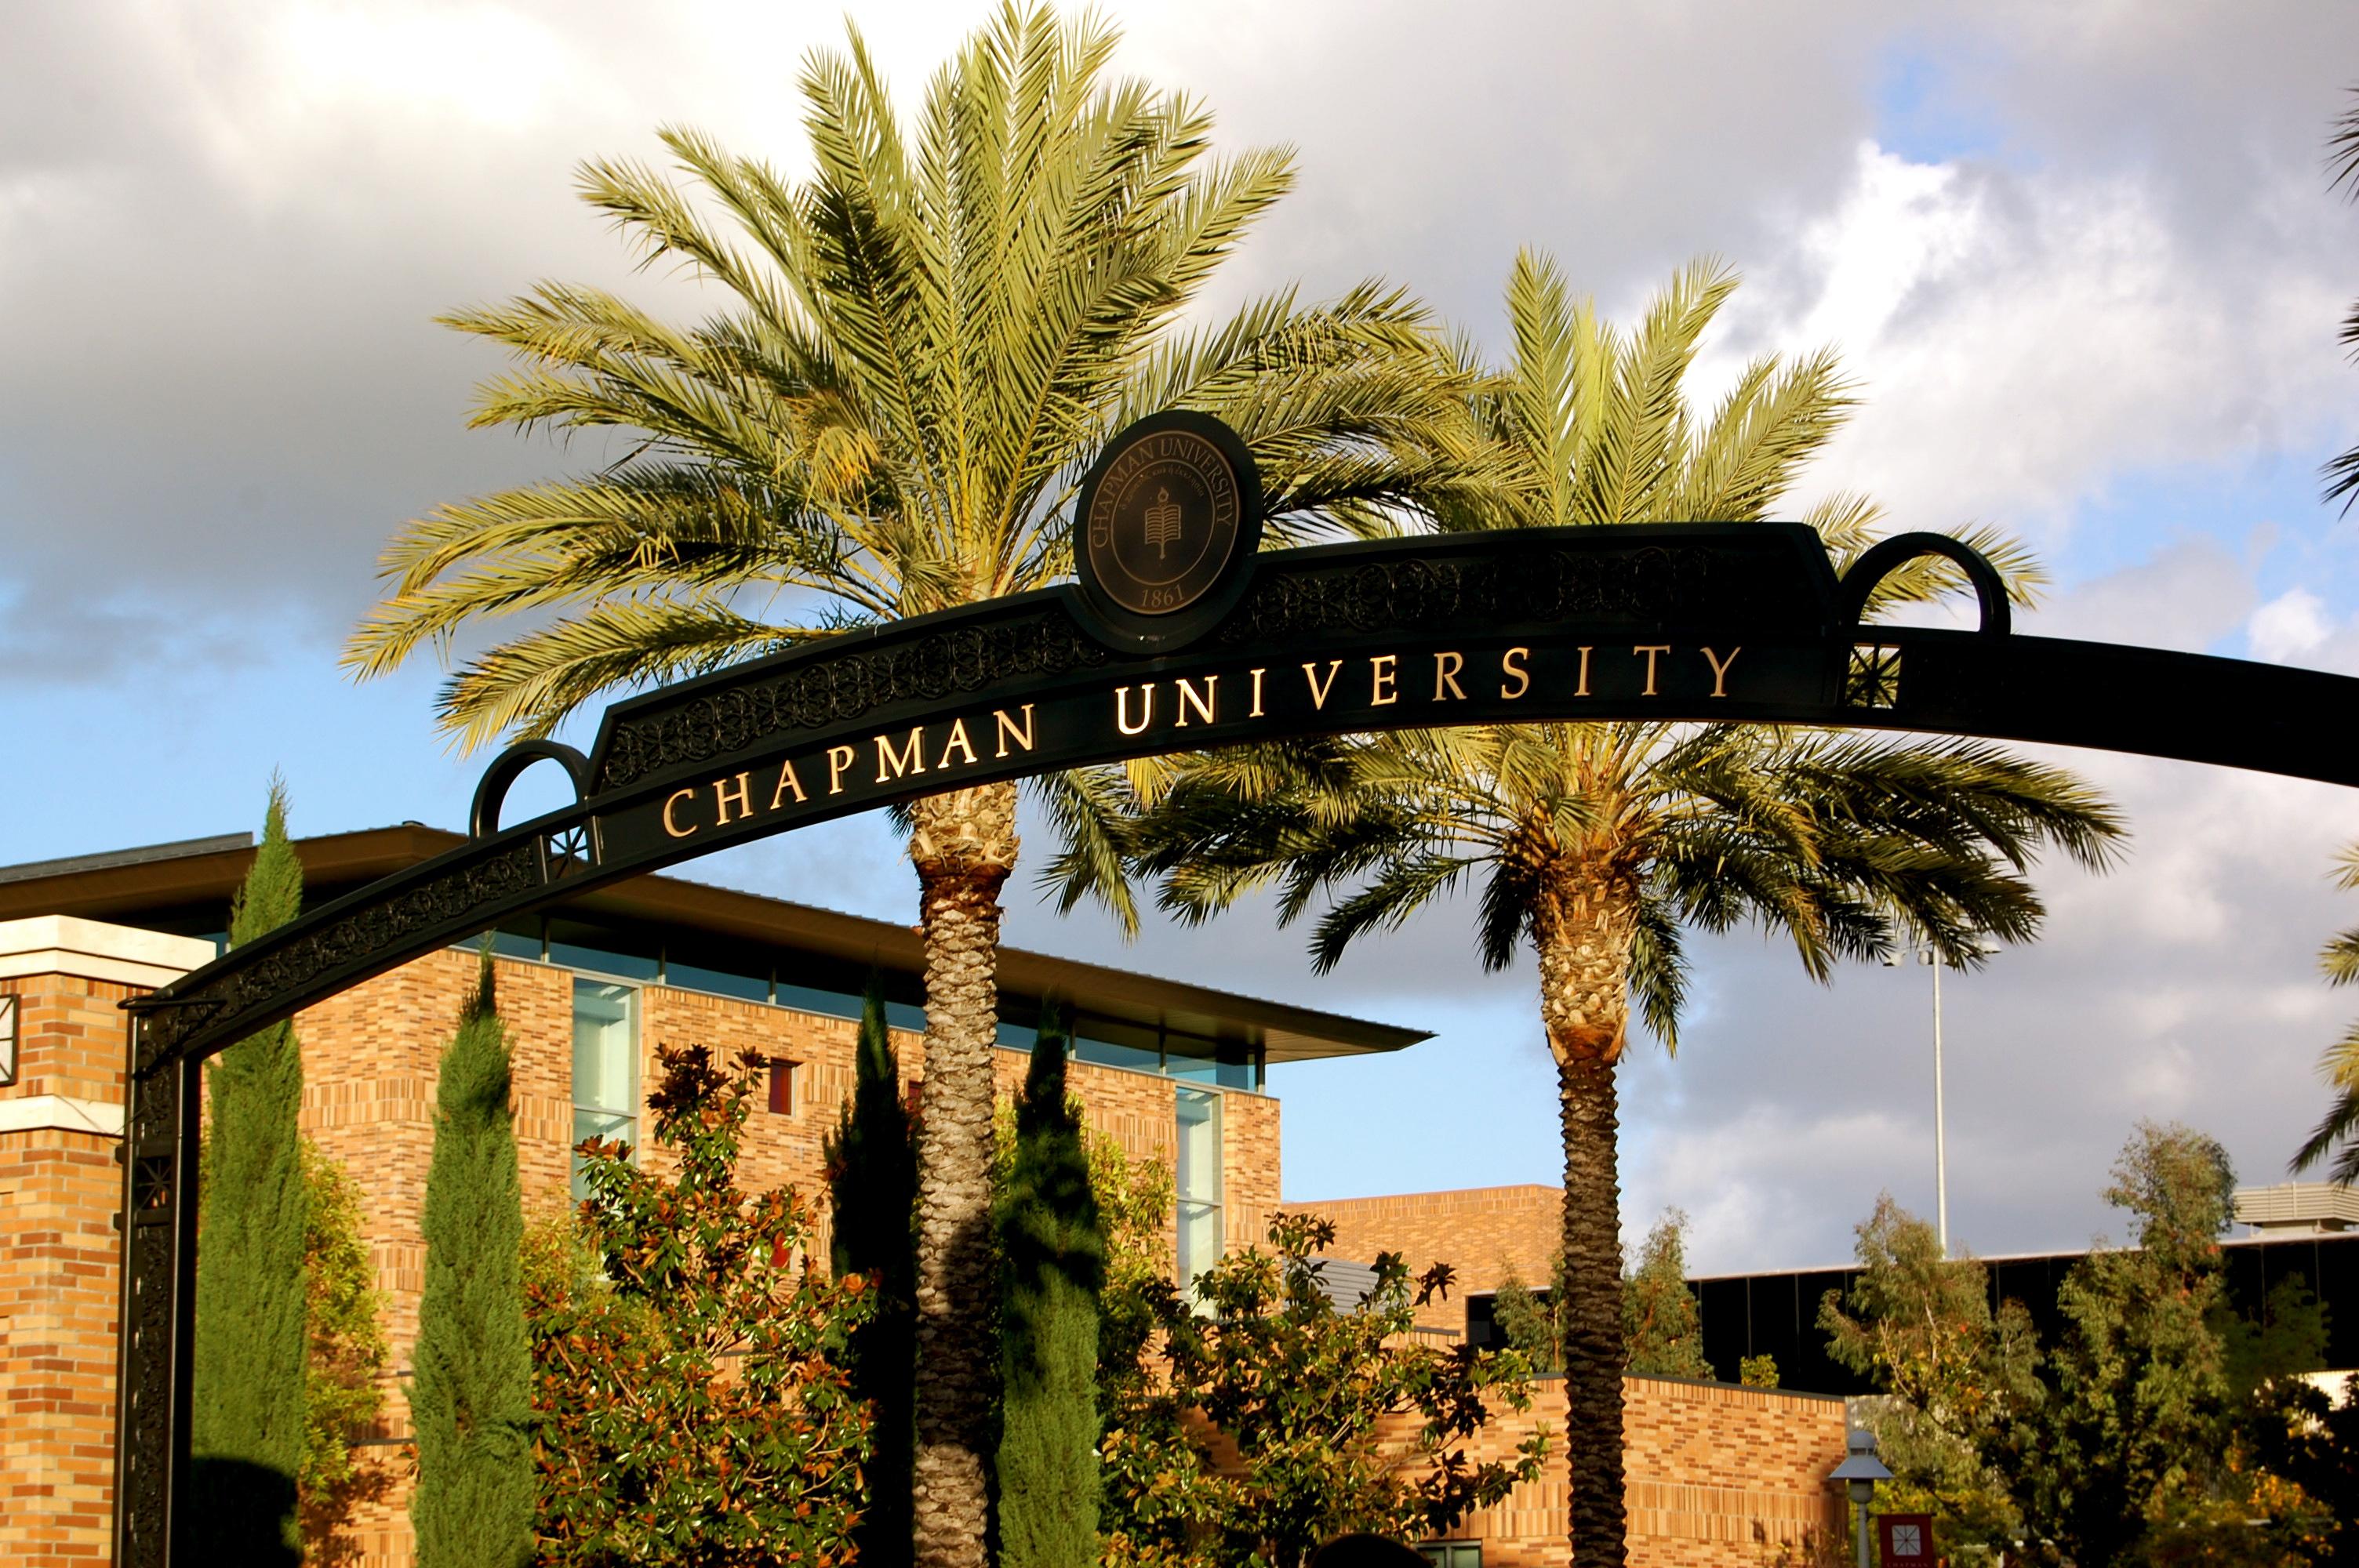 Chapman University arch